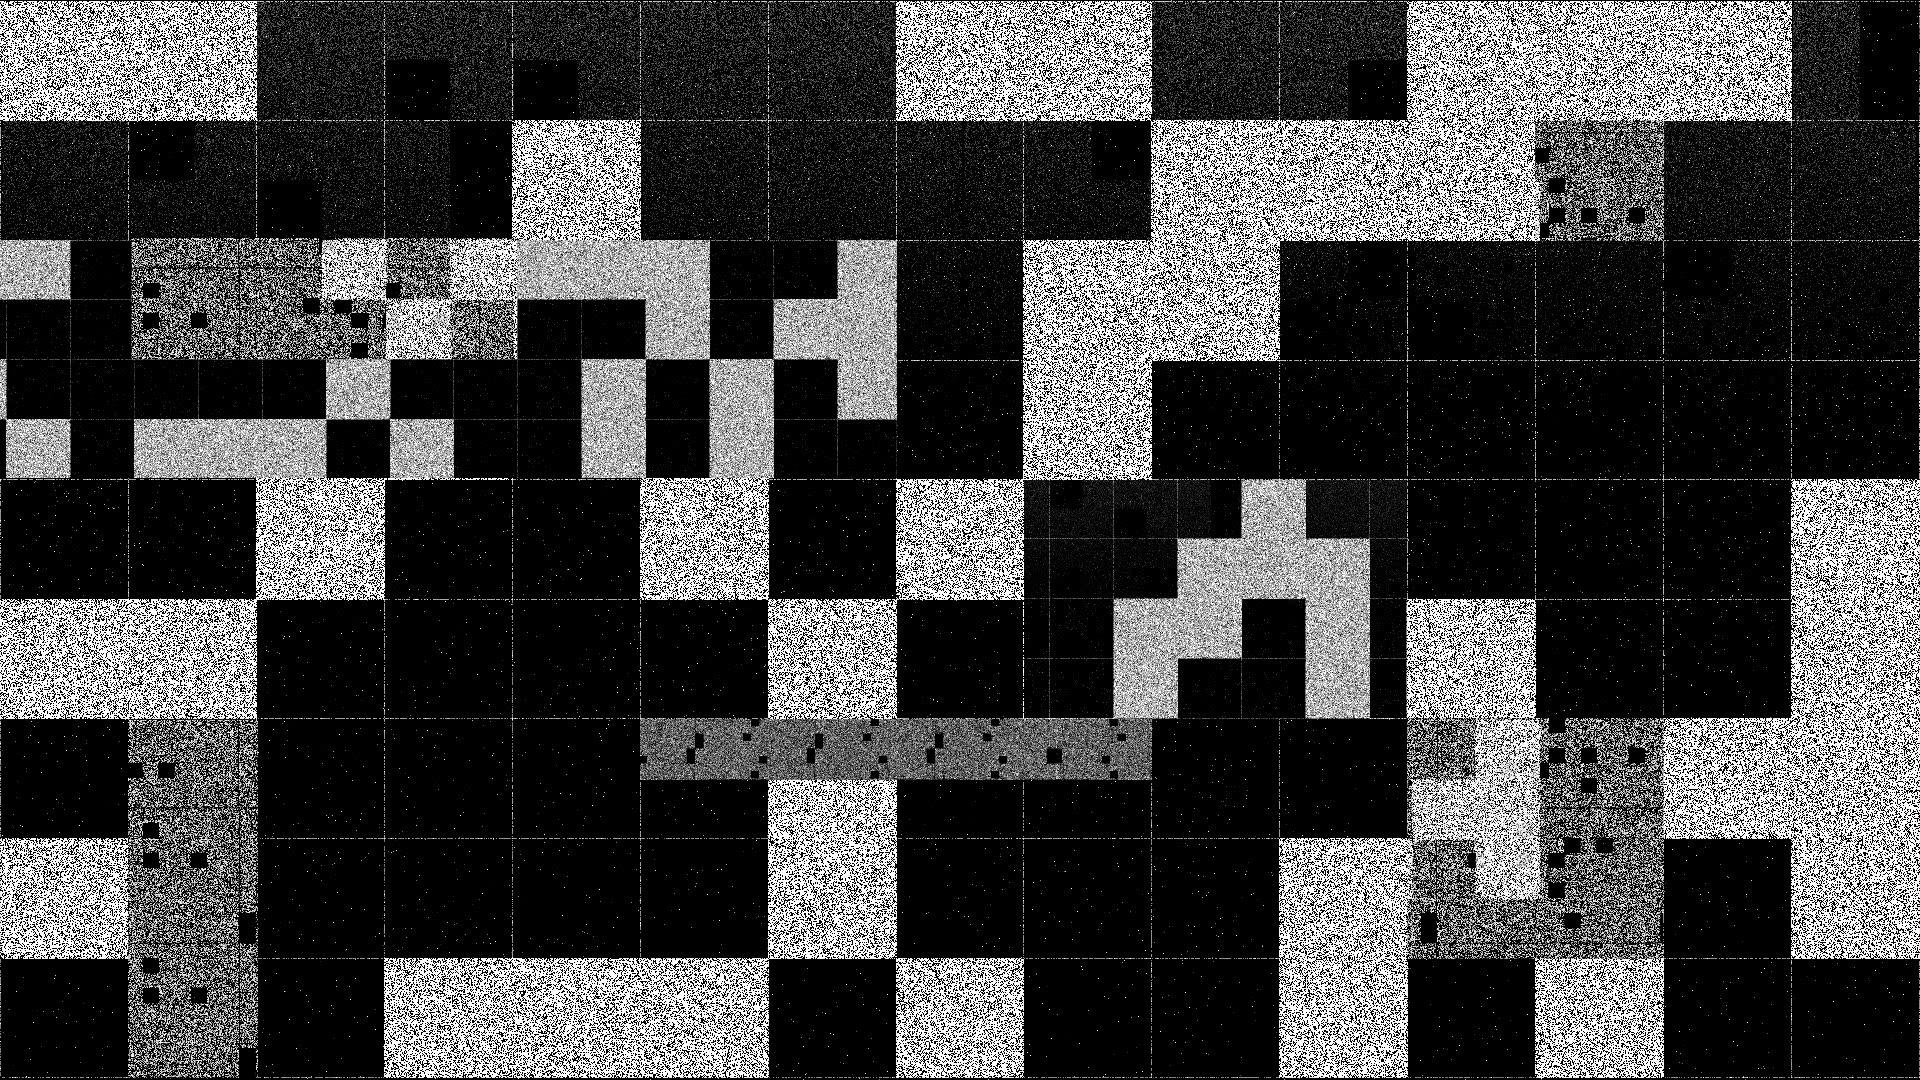 Decrypt by Peter Clark